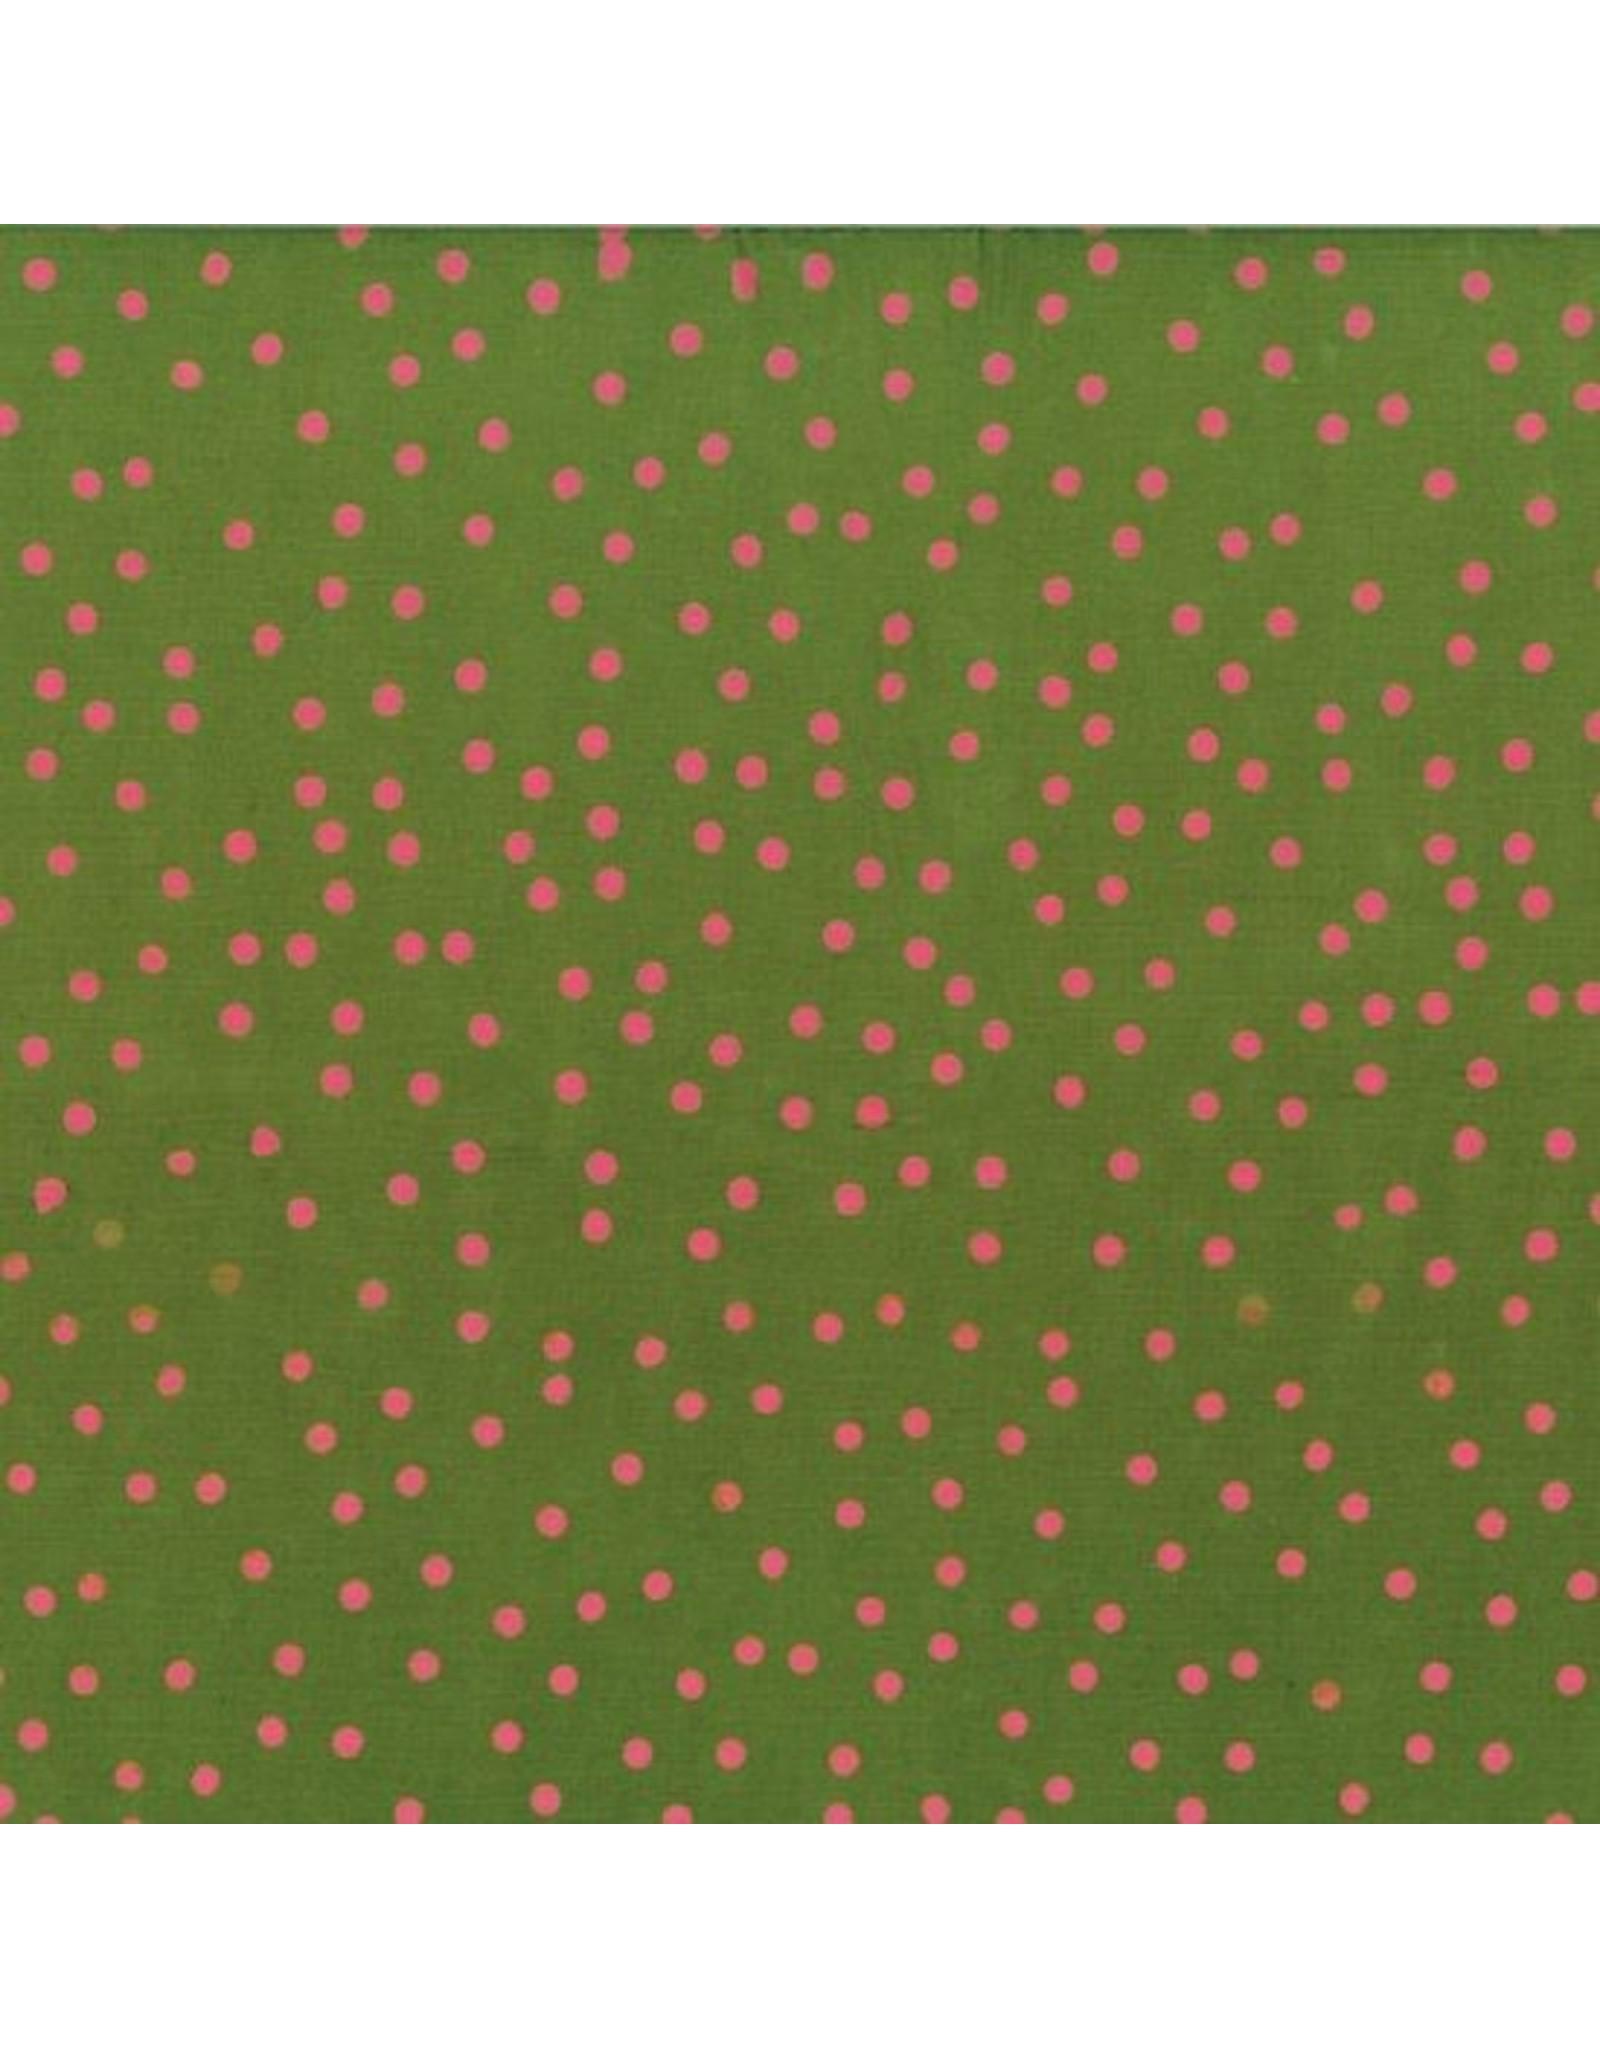 Me+You by Hoffman Fabrics Indah Batiks - 182-Watermelon